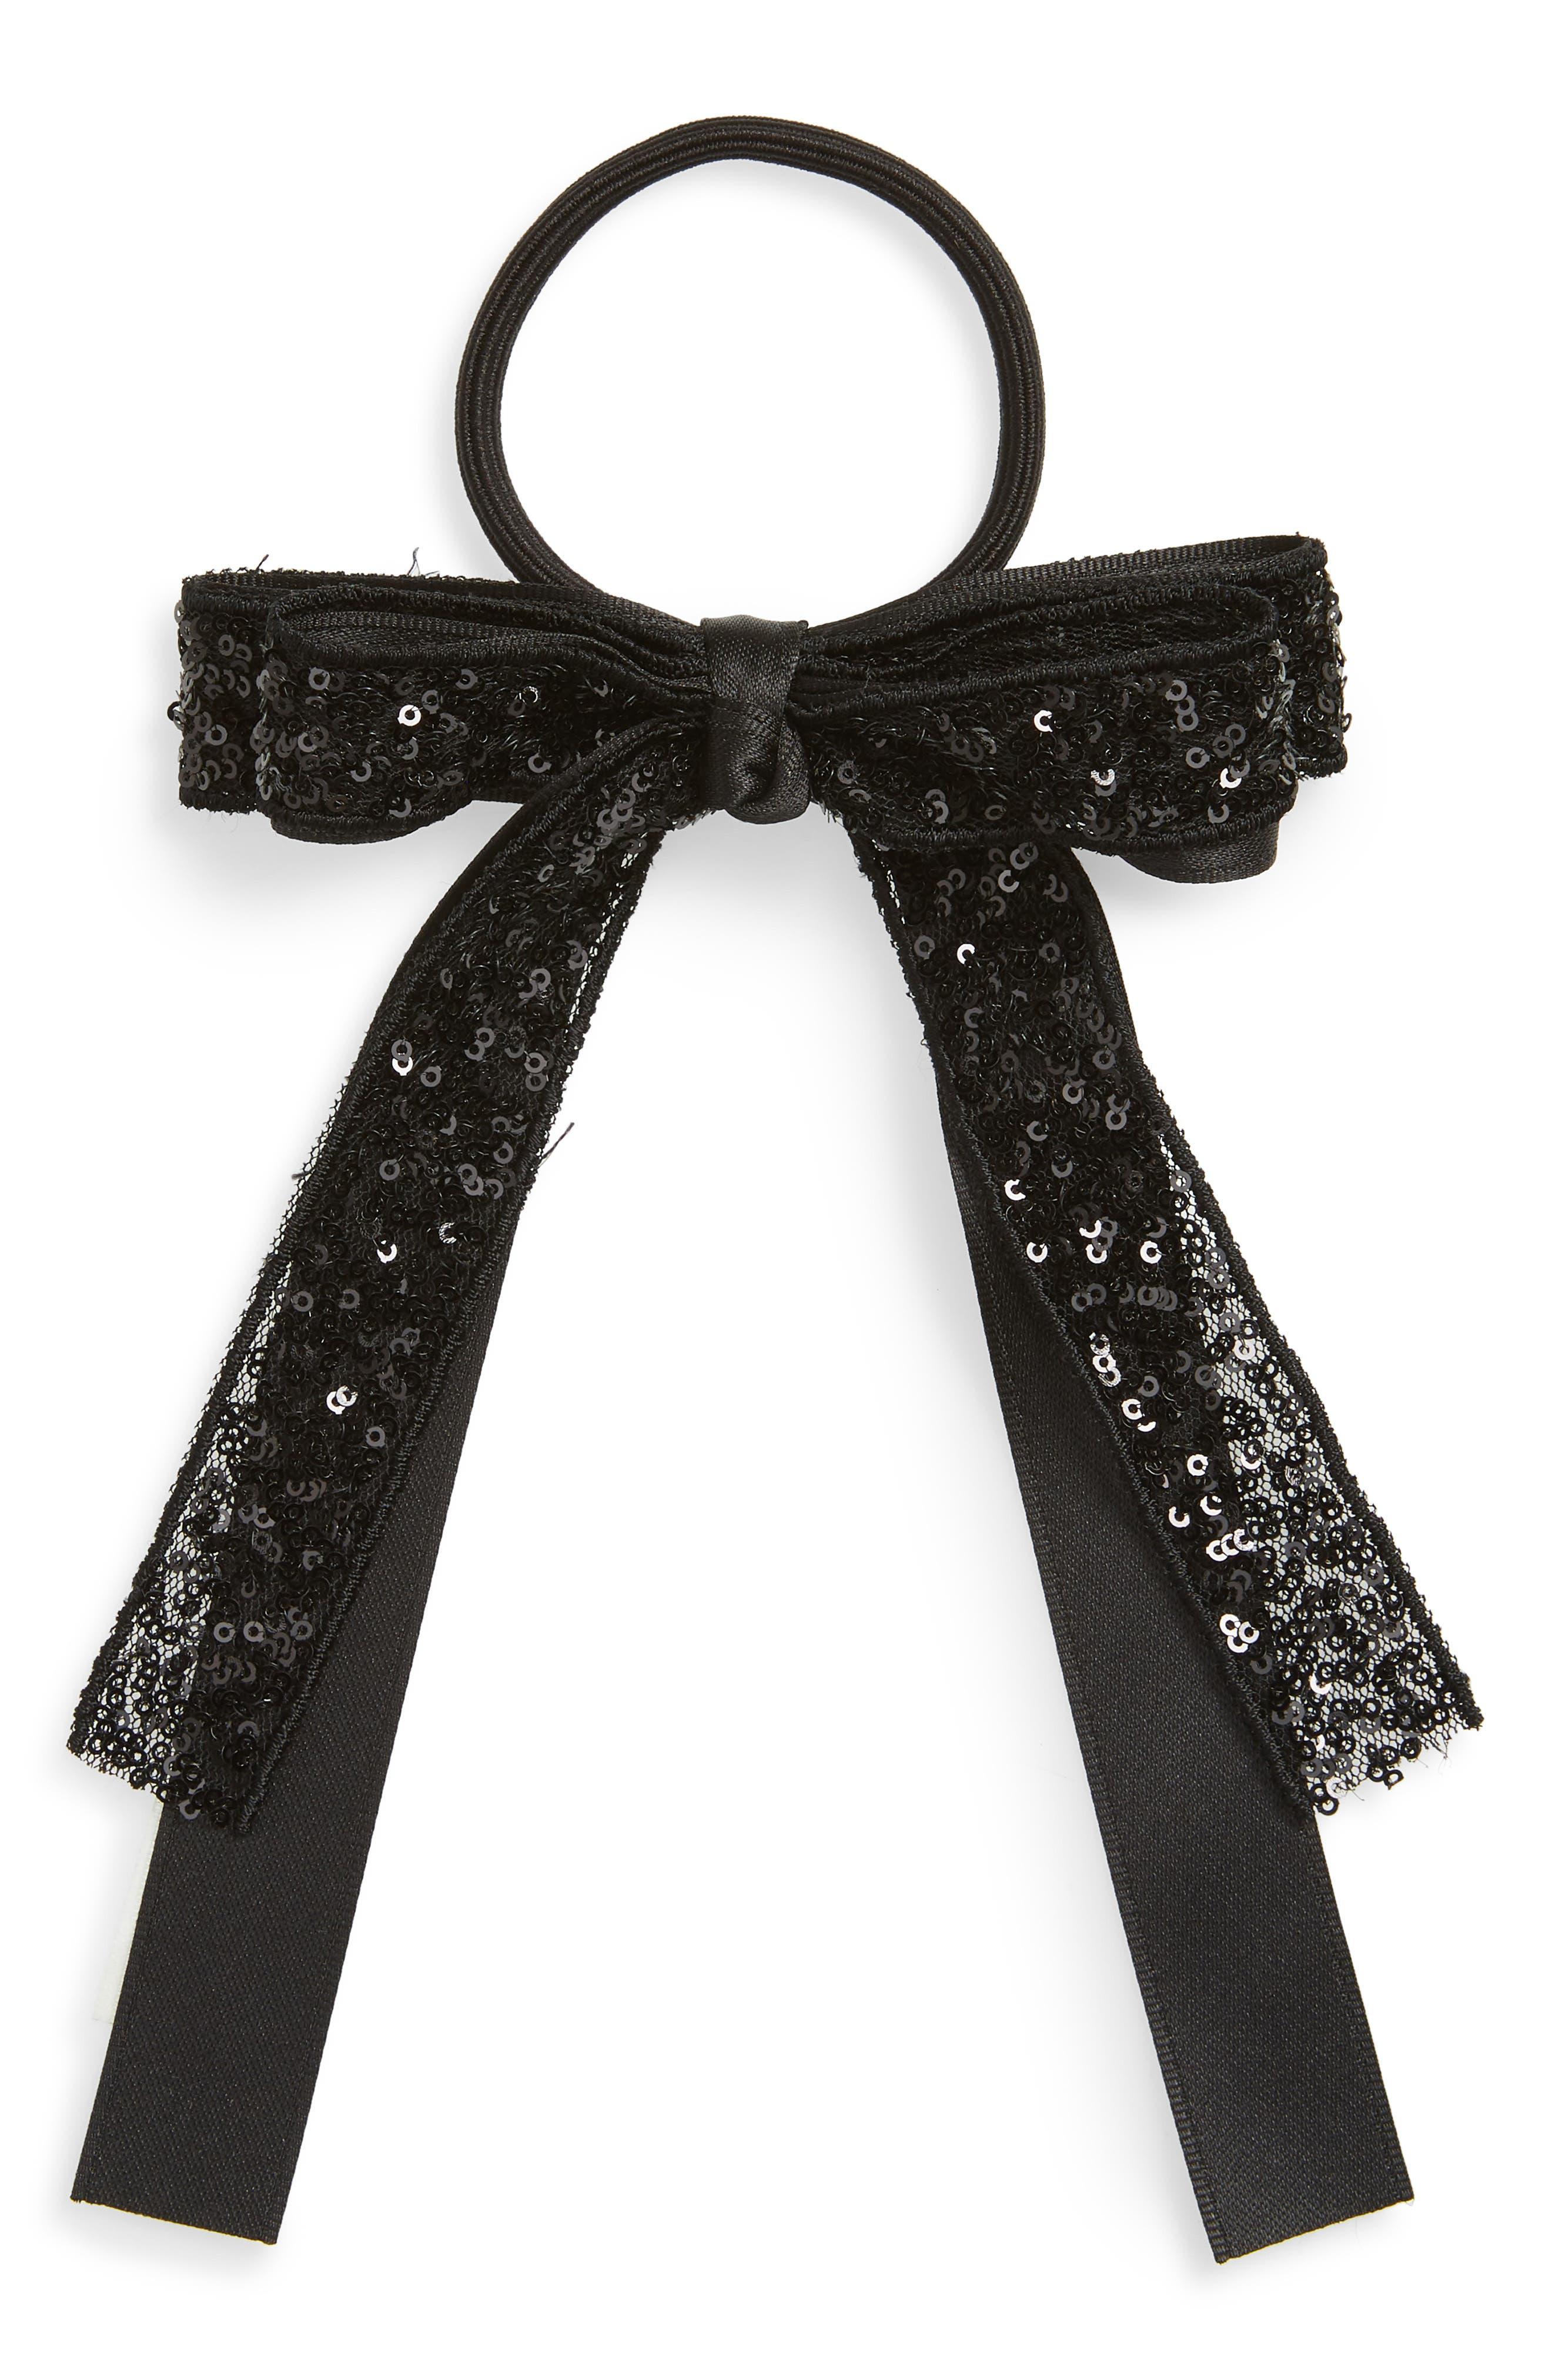 CARA, Sequin Bow Ponytail Holder, Main thumbnail 1, color, BLACK